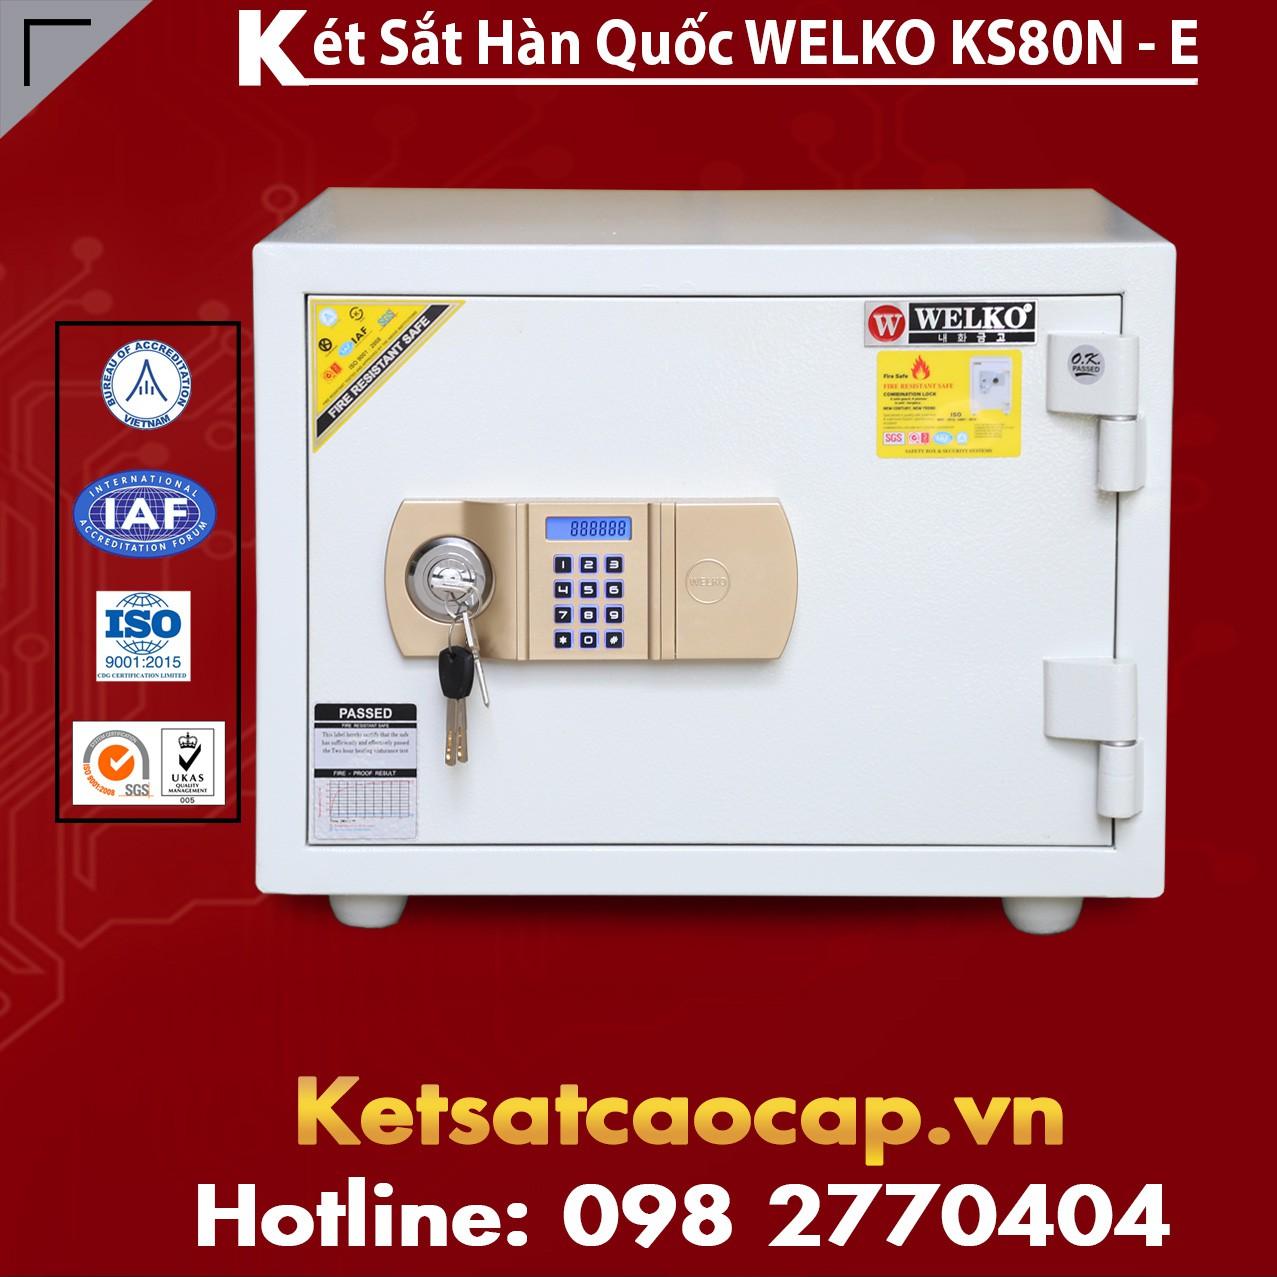 Két Sắt Văn Phòng WELKO KS80N White - E Gold